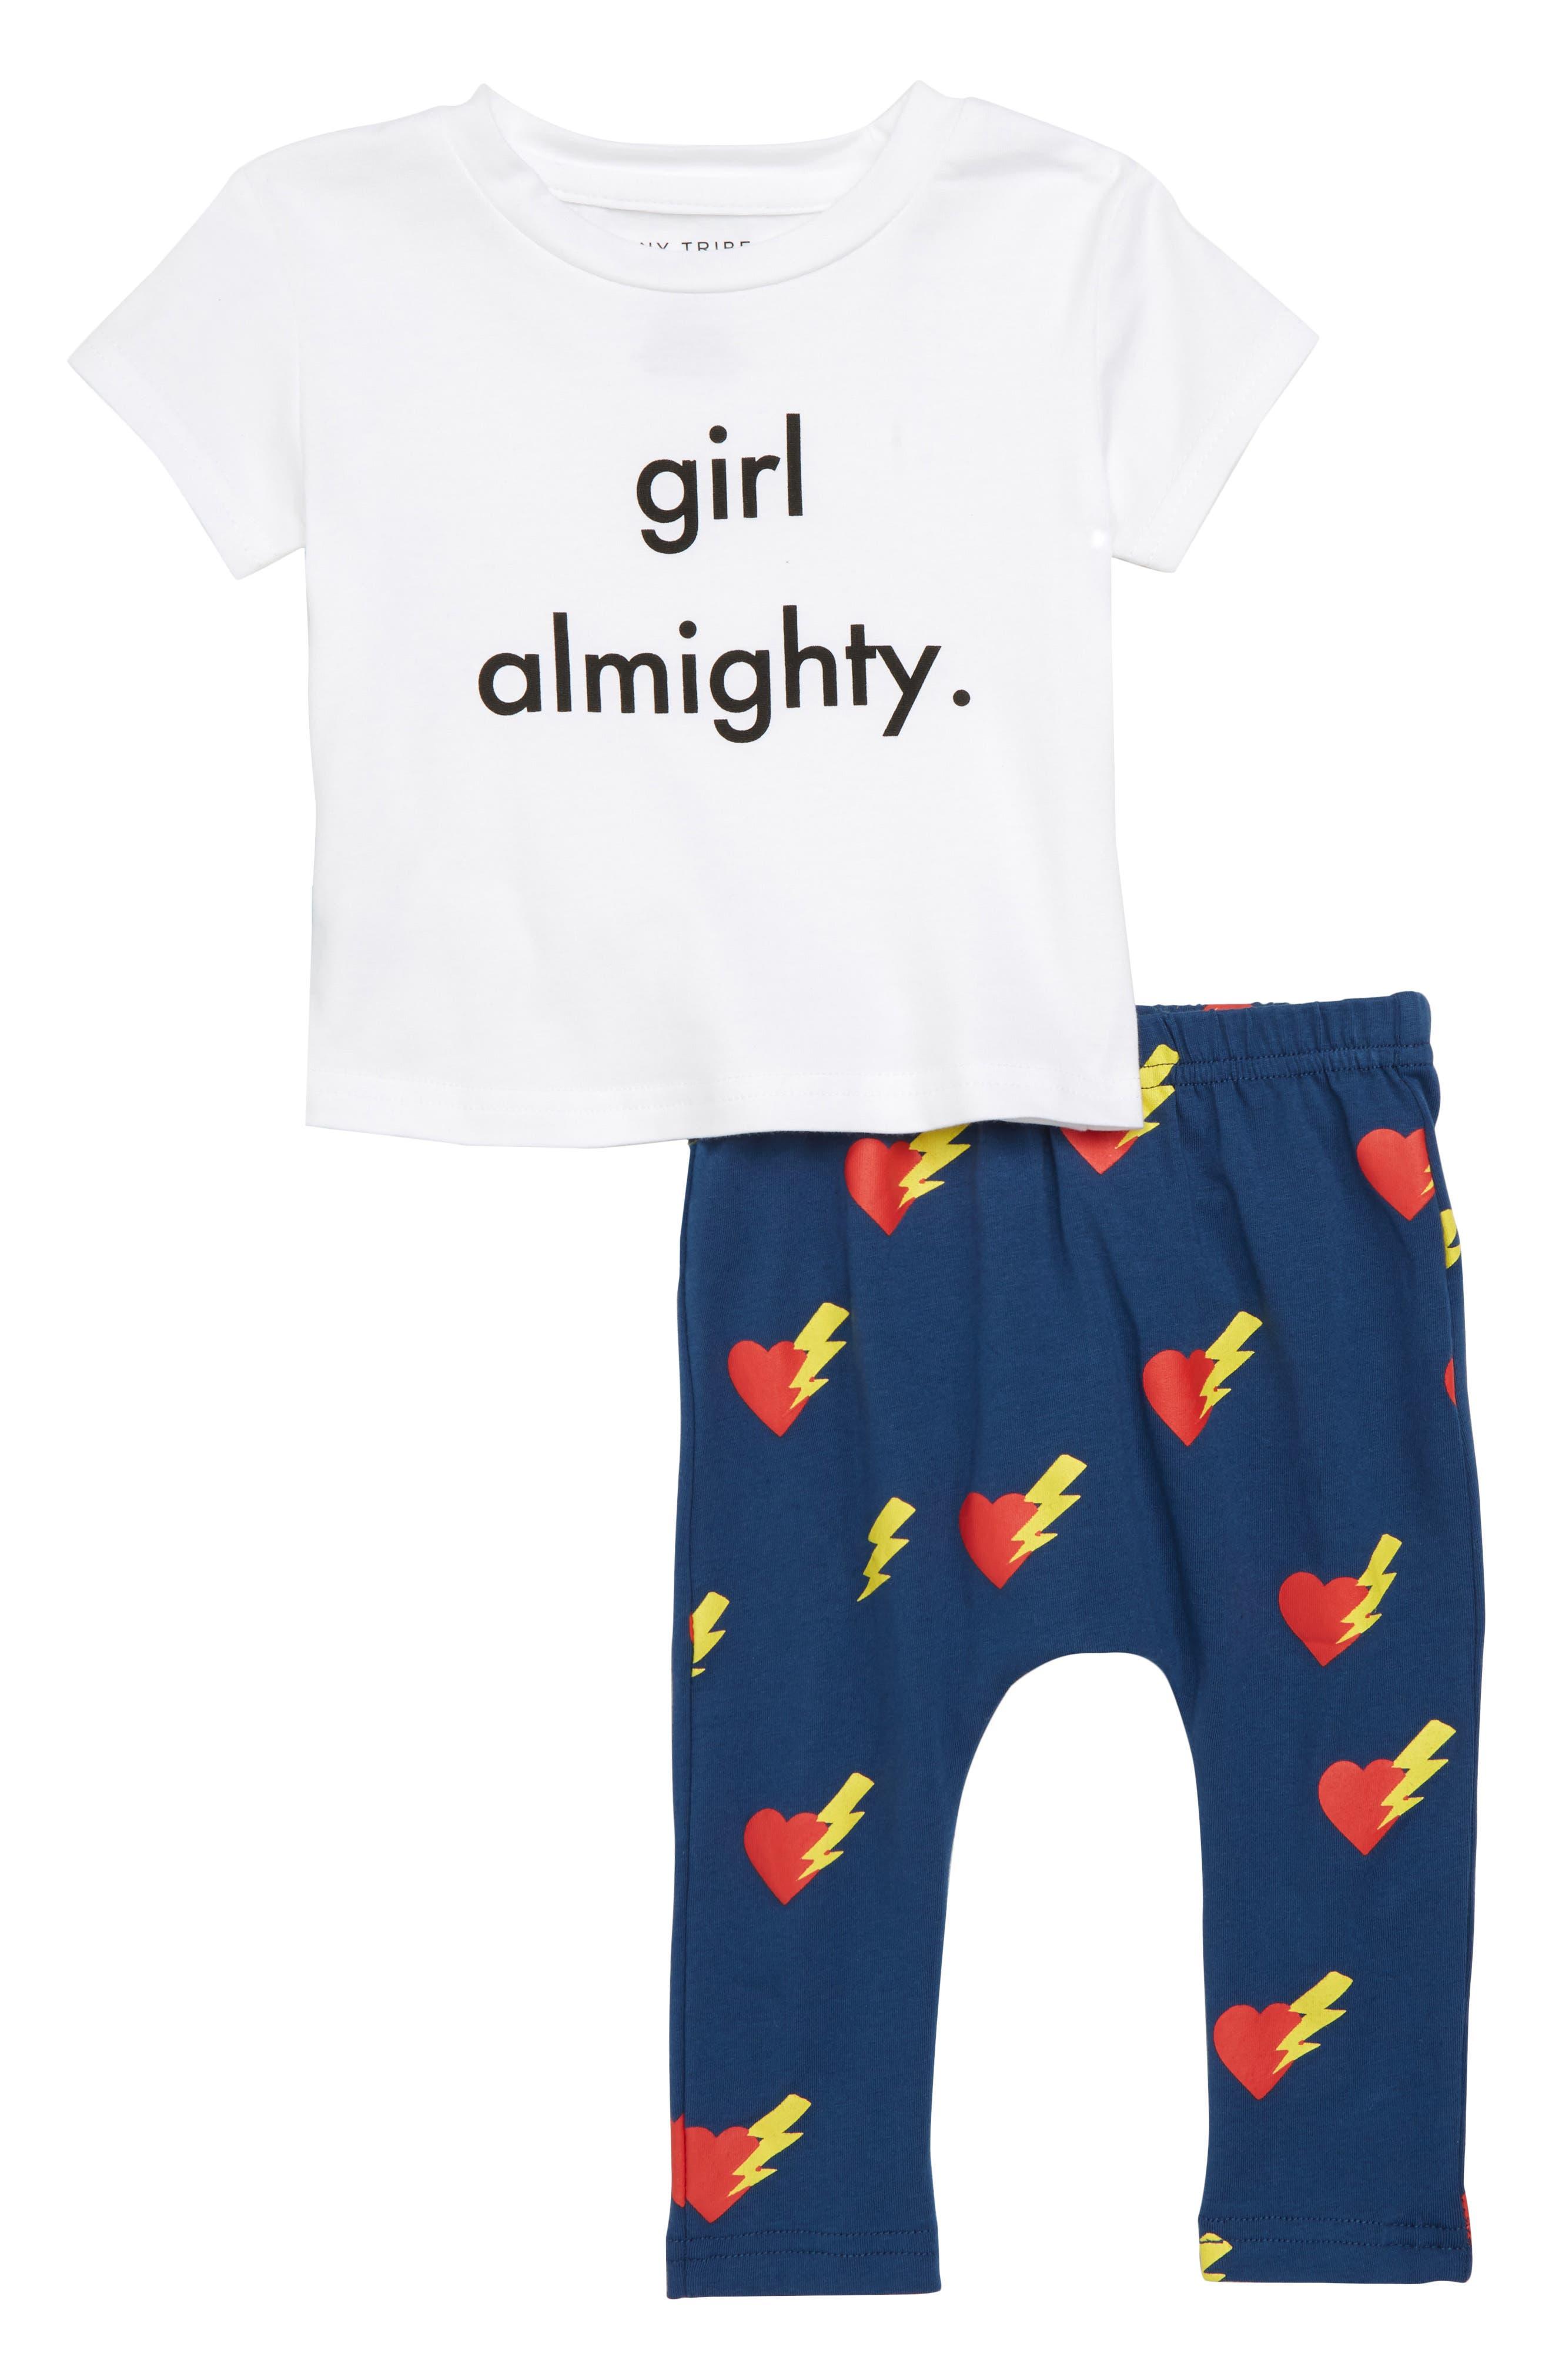 Girls Almighty Tee & Leggings Set,                         Main,                         color, White/ Navy